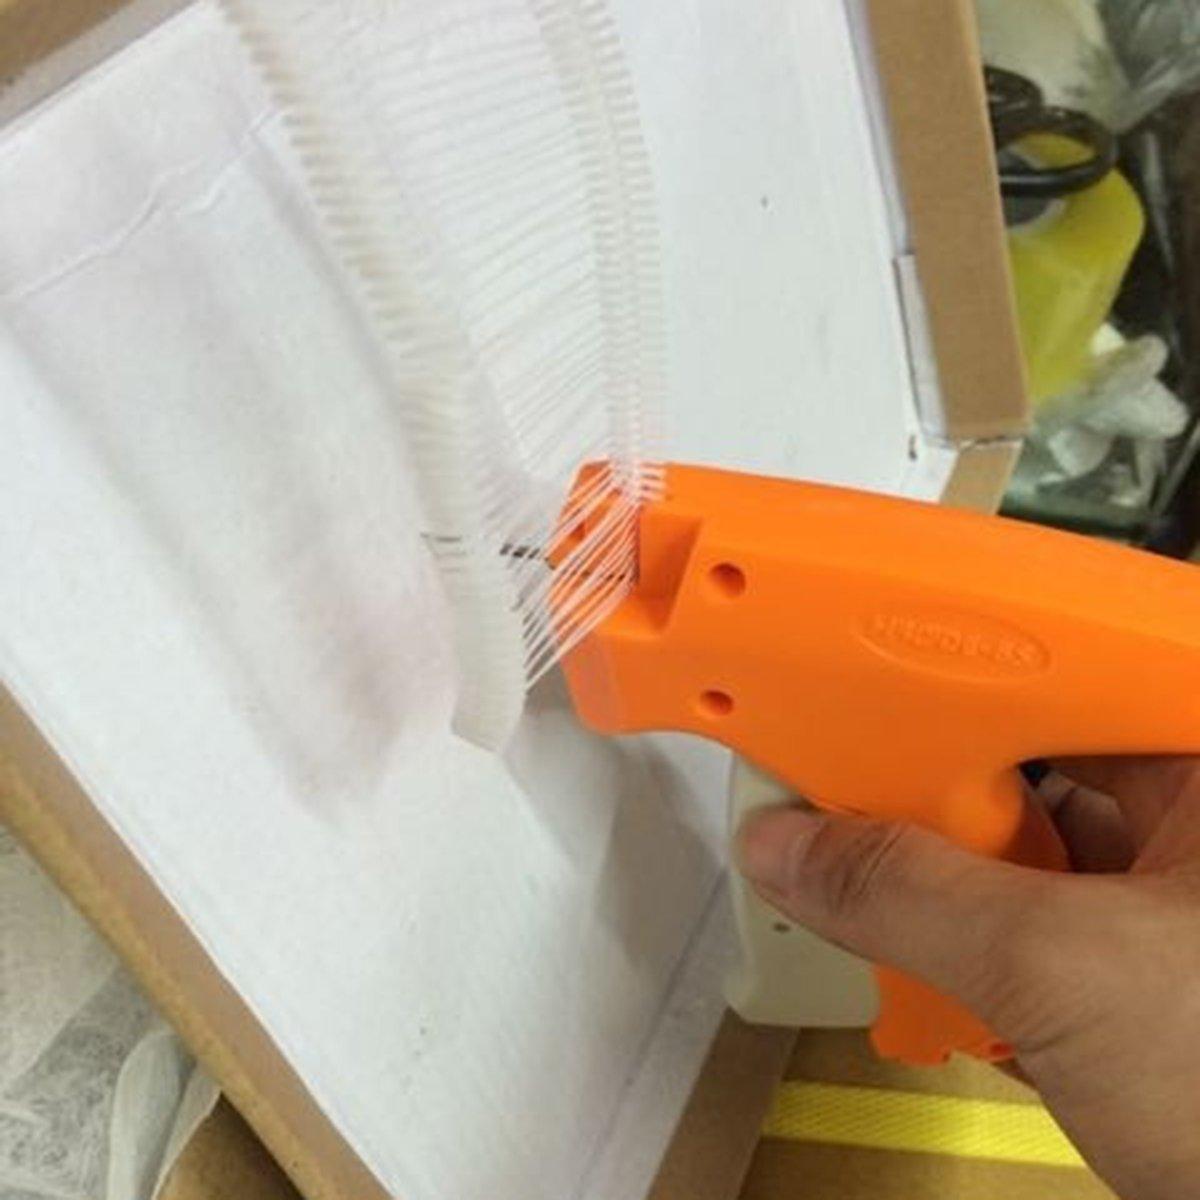 Latinaric 1000pcs Heftf/äden F/äden f/ür Fein Pistole